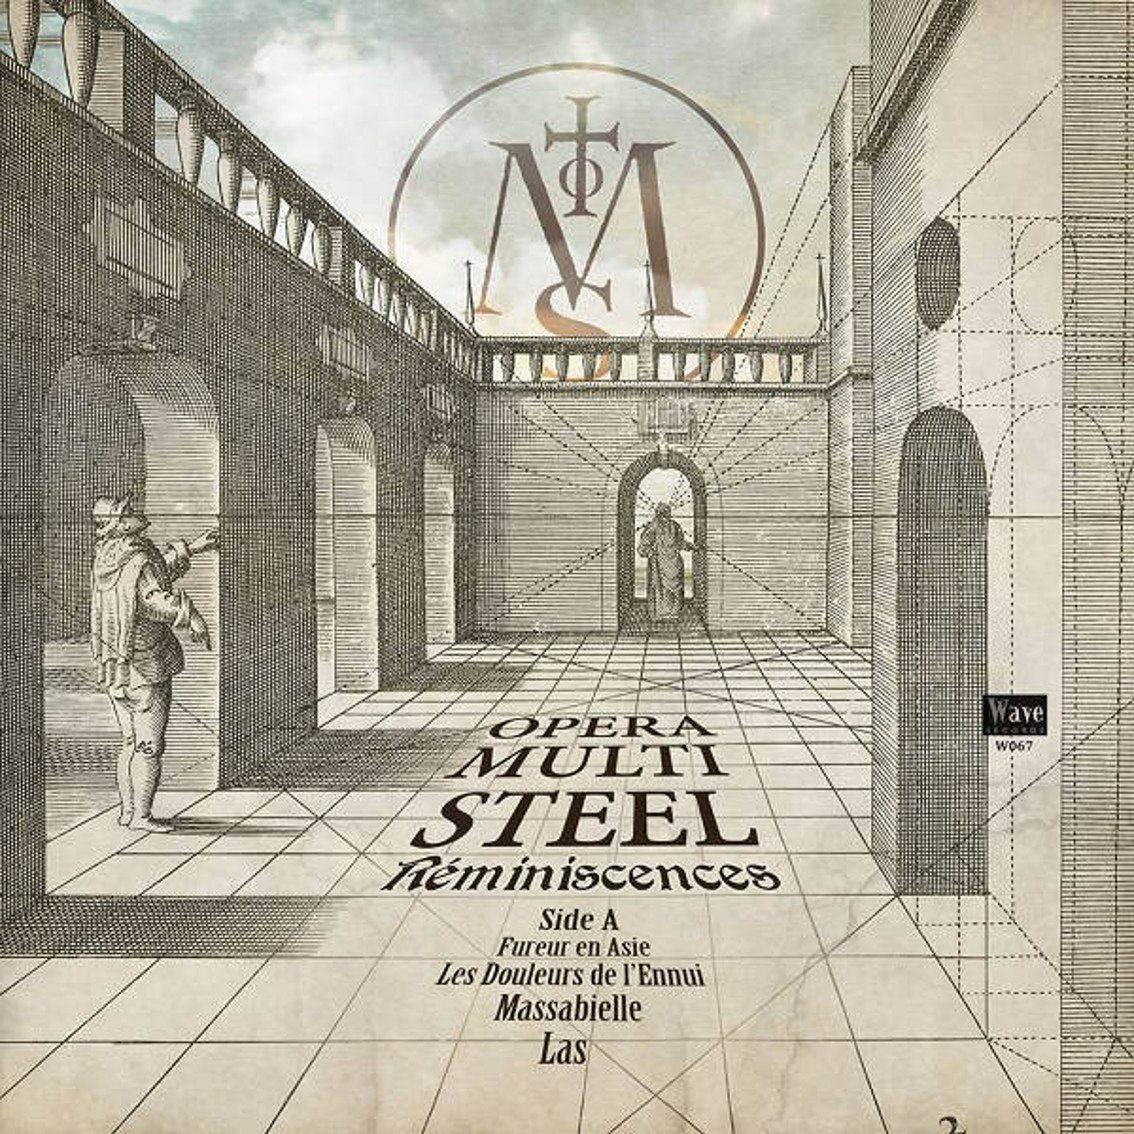 Opera Multi Steel plans picture vinyl in December,'Réminiscences', feat. revisited classics